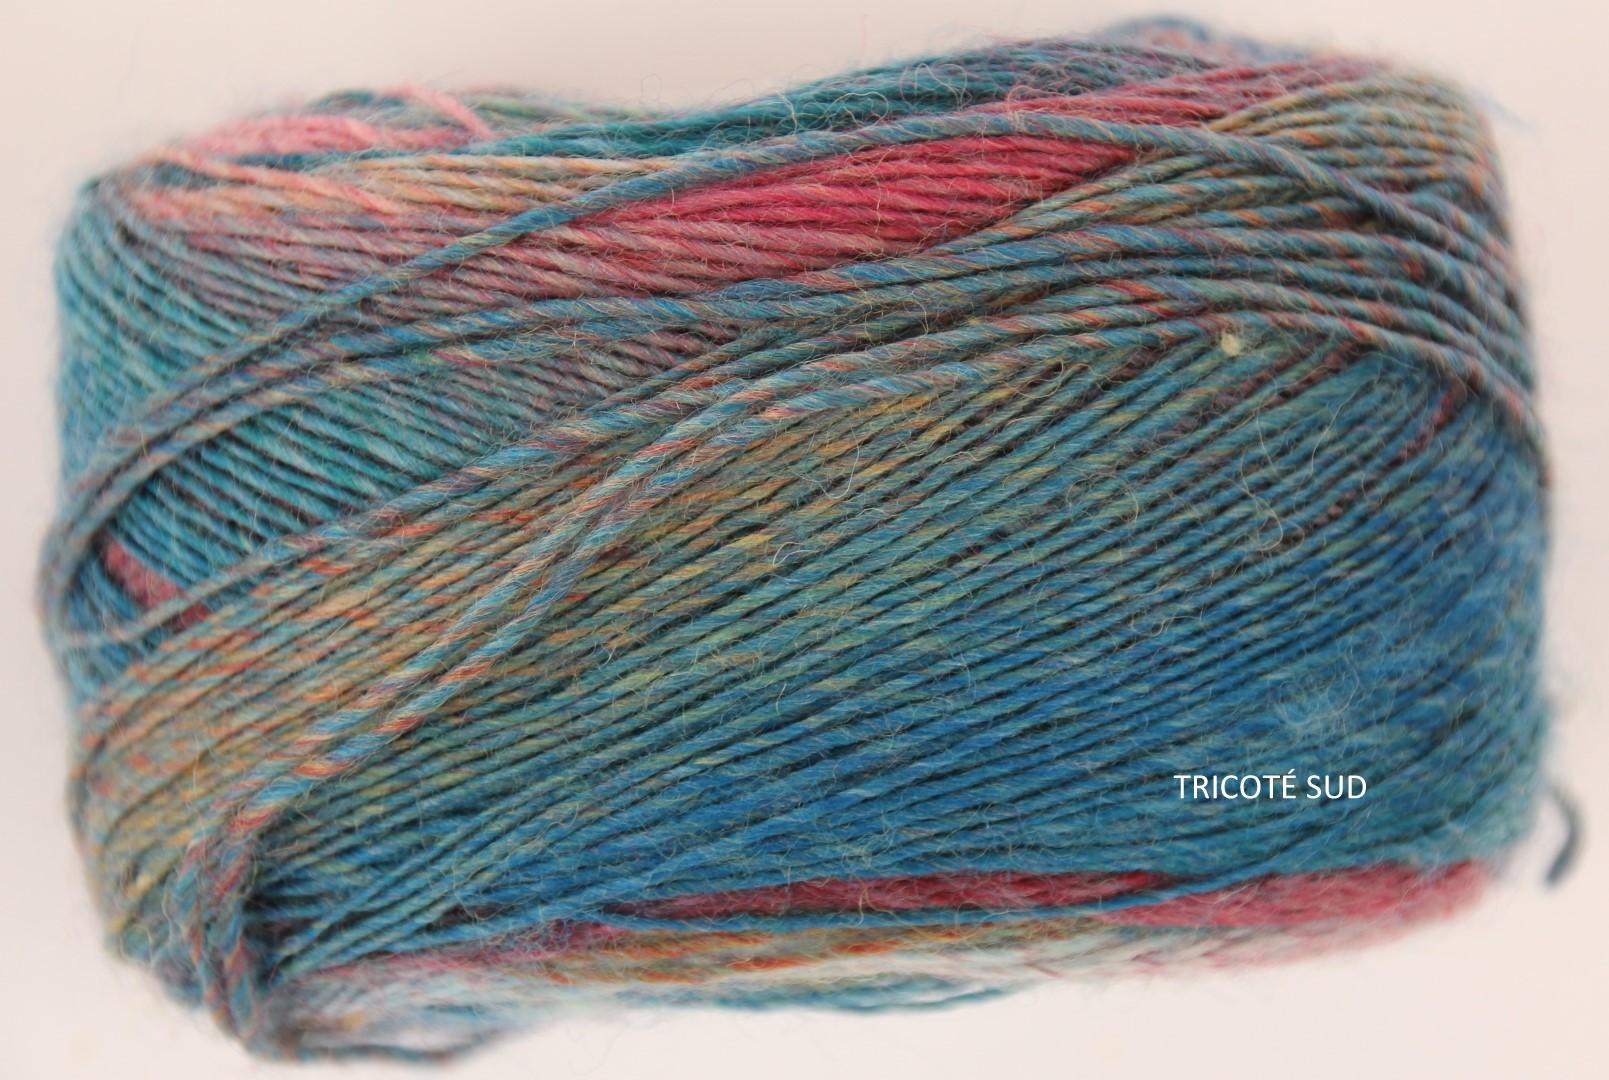 GRETA LANG YARNS COLORIS 155 (1) (Large)